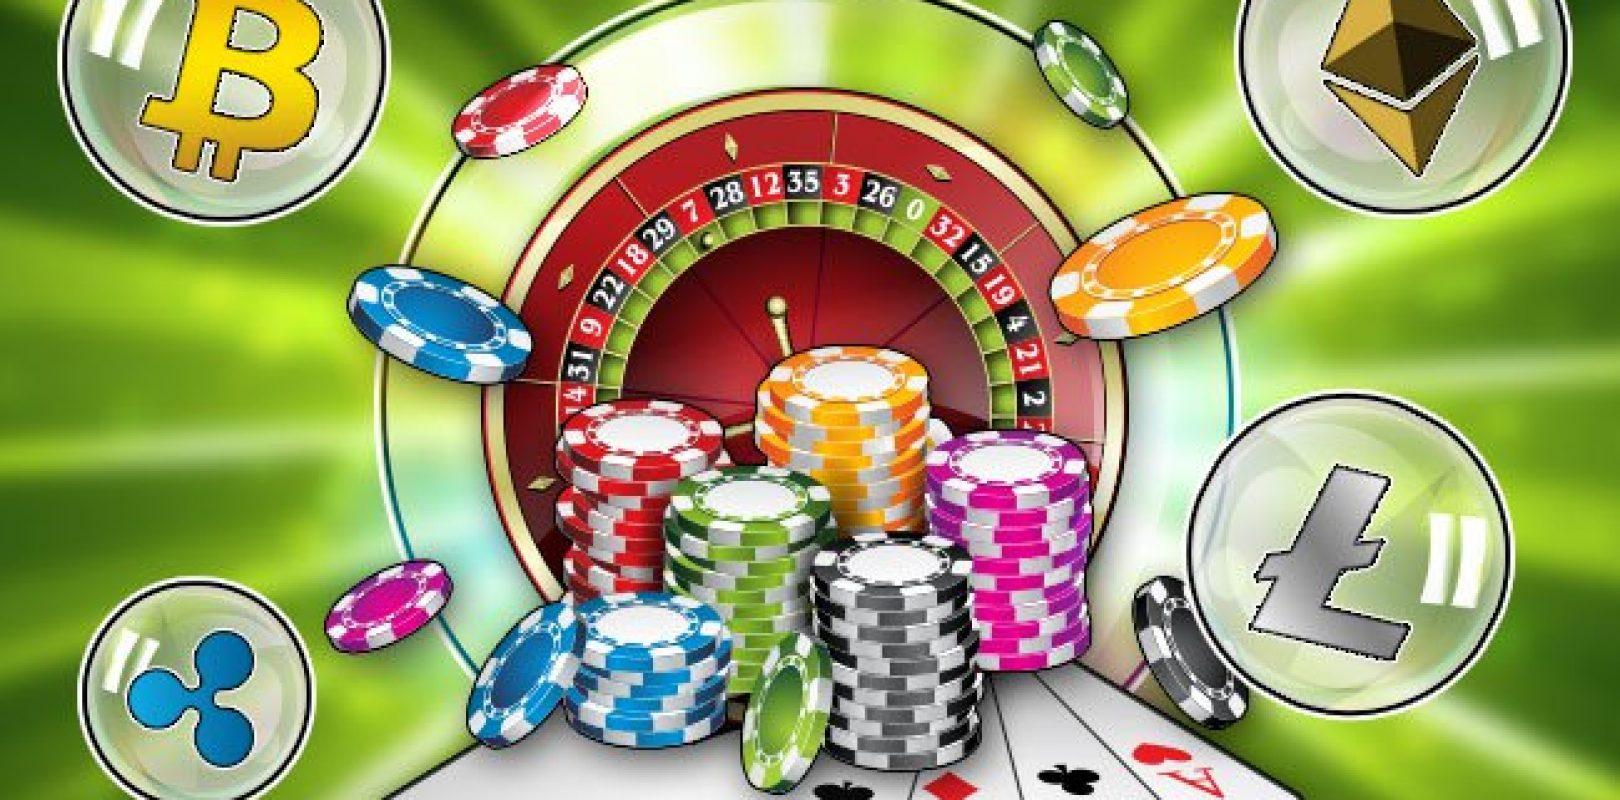 Wheel of fortune bitcoin slot rtp